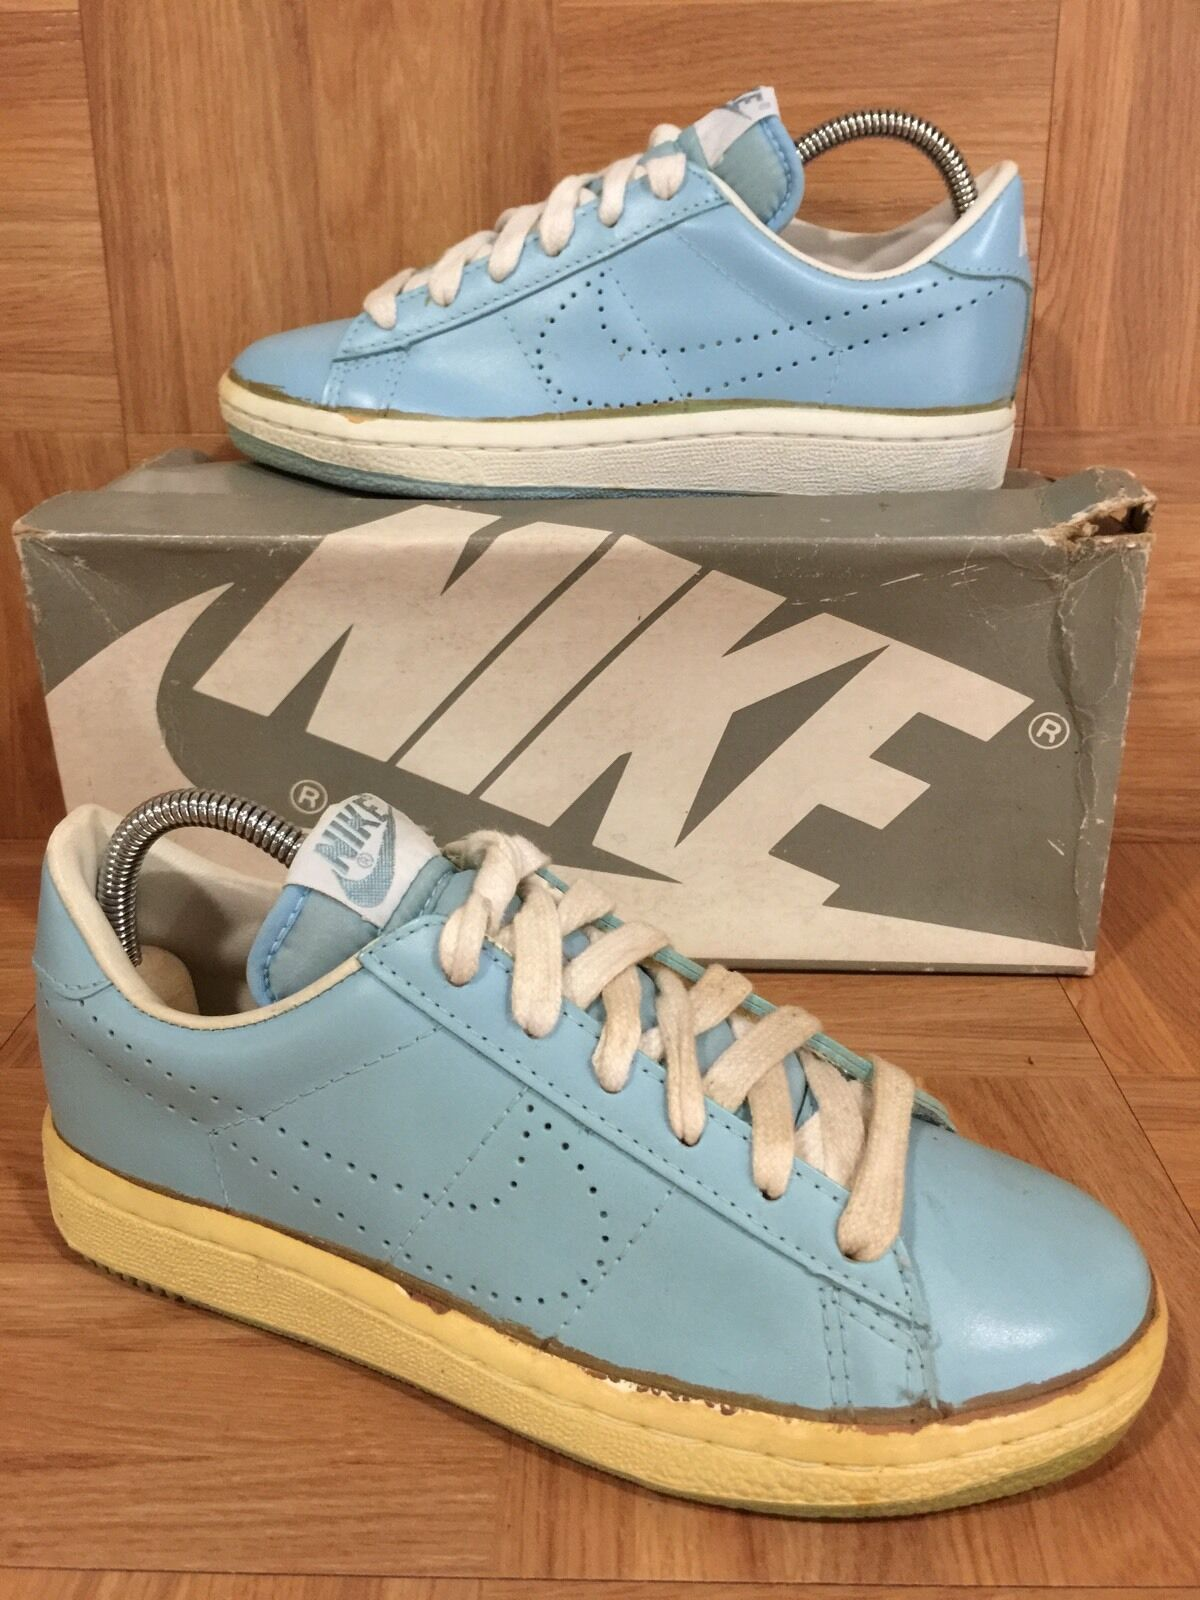 Nike air vapore donne ace scarpa da tennis 724870-100 dimensioni 7 (2lkr upc 1196)